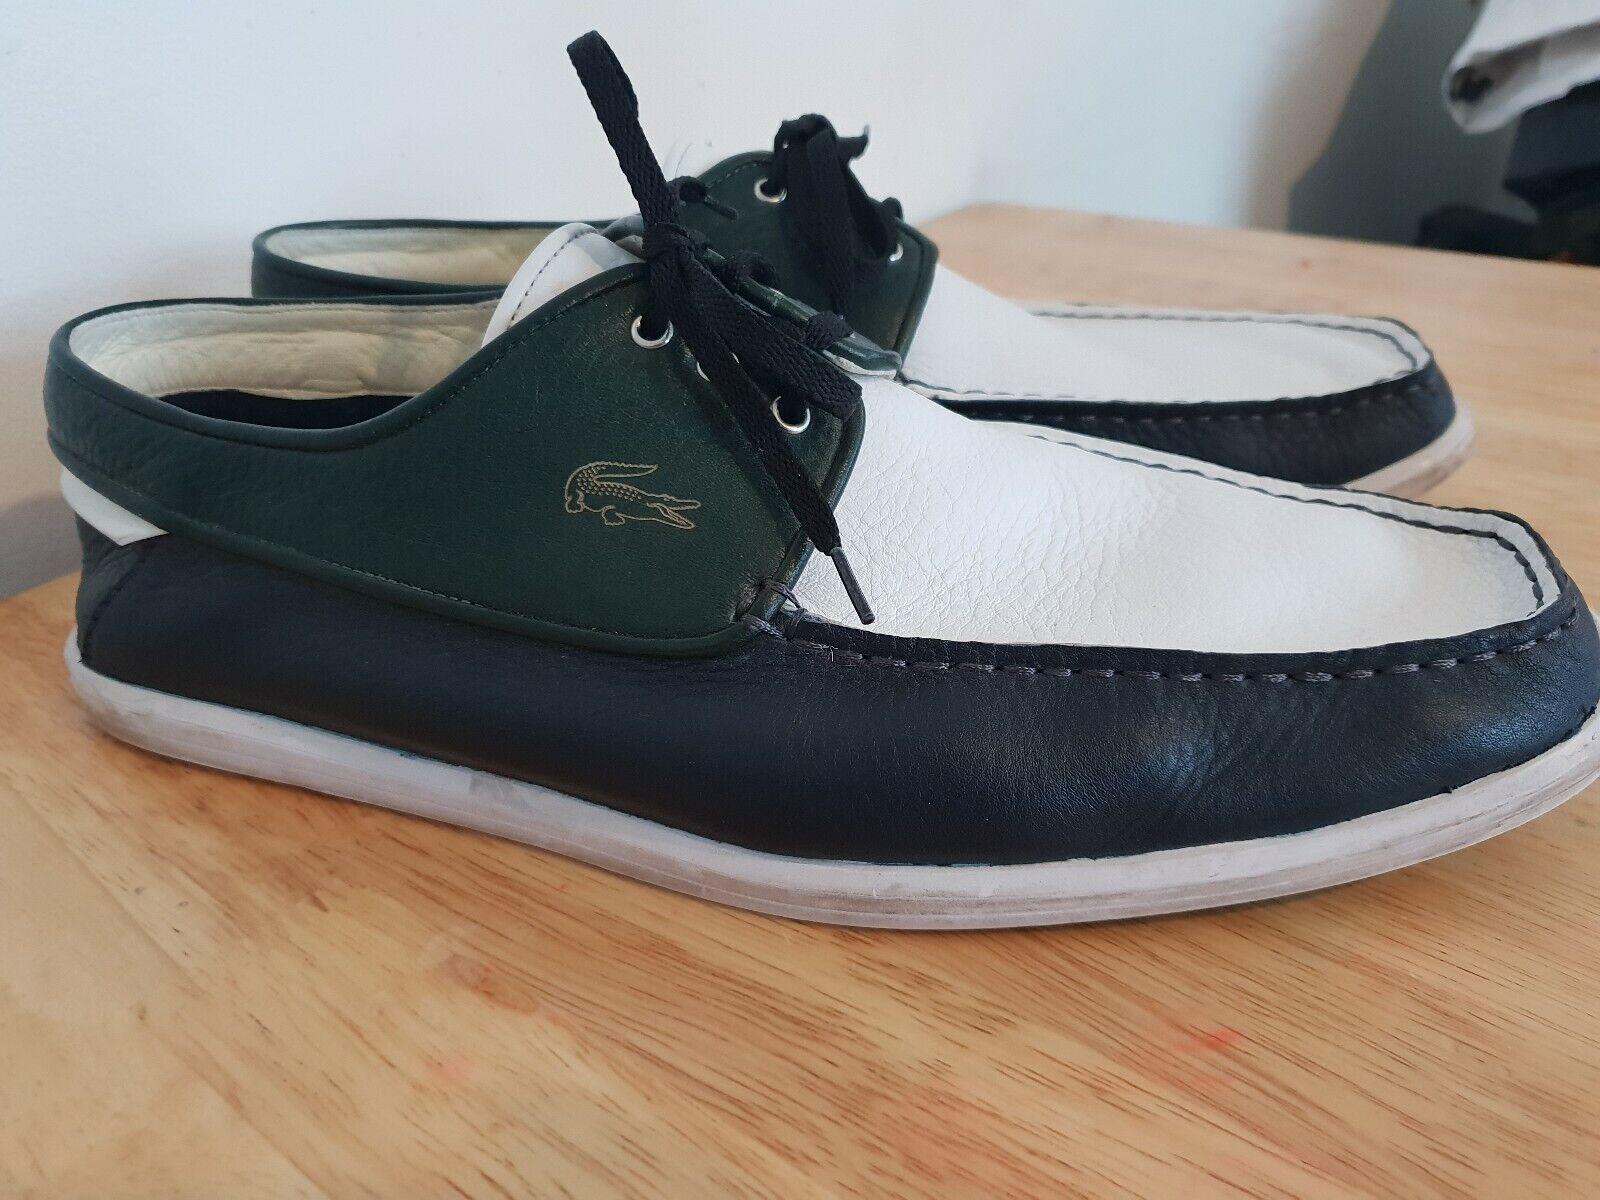 Lacoste Paris Leather Loafers UK Größe 12